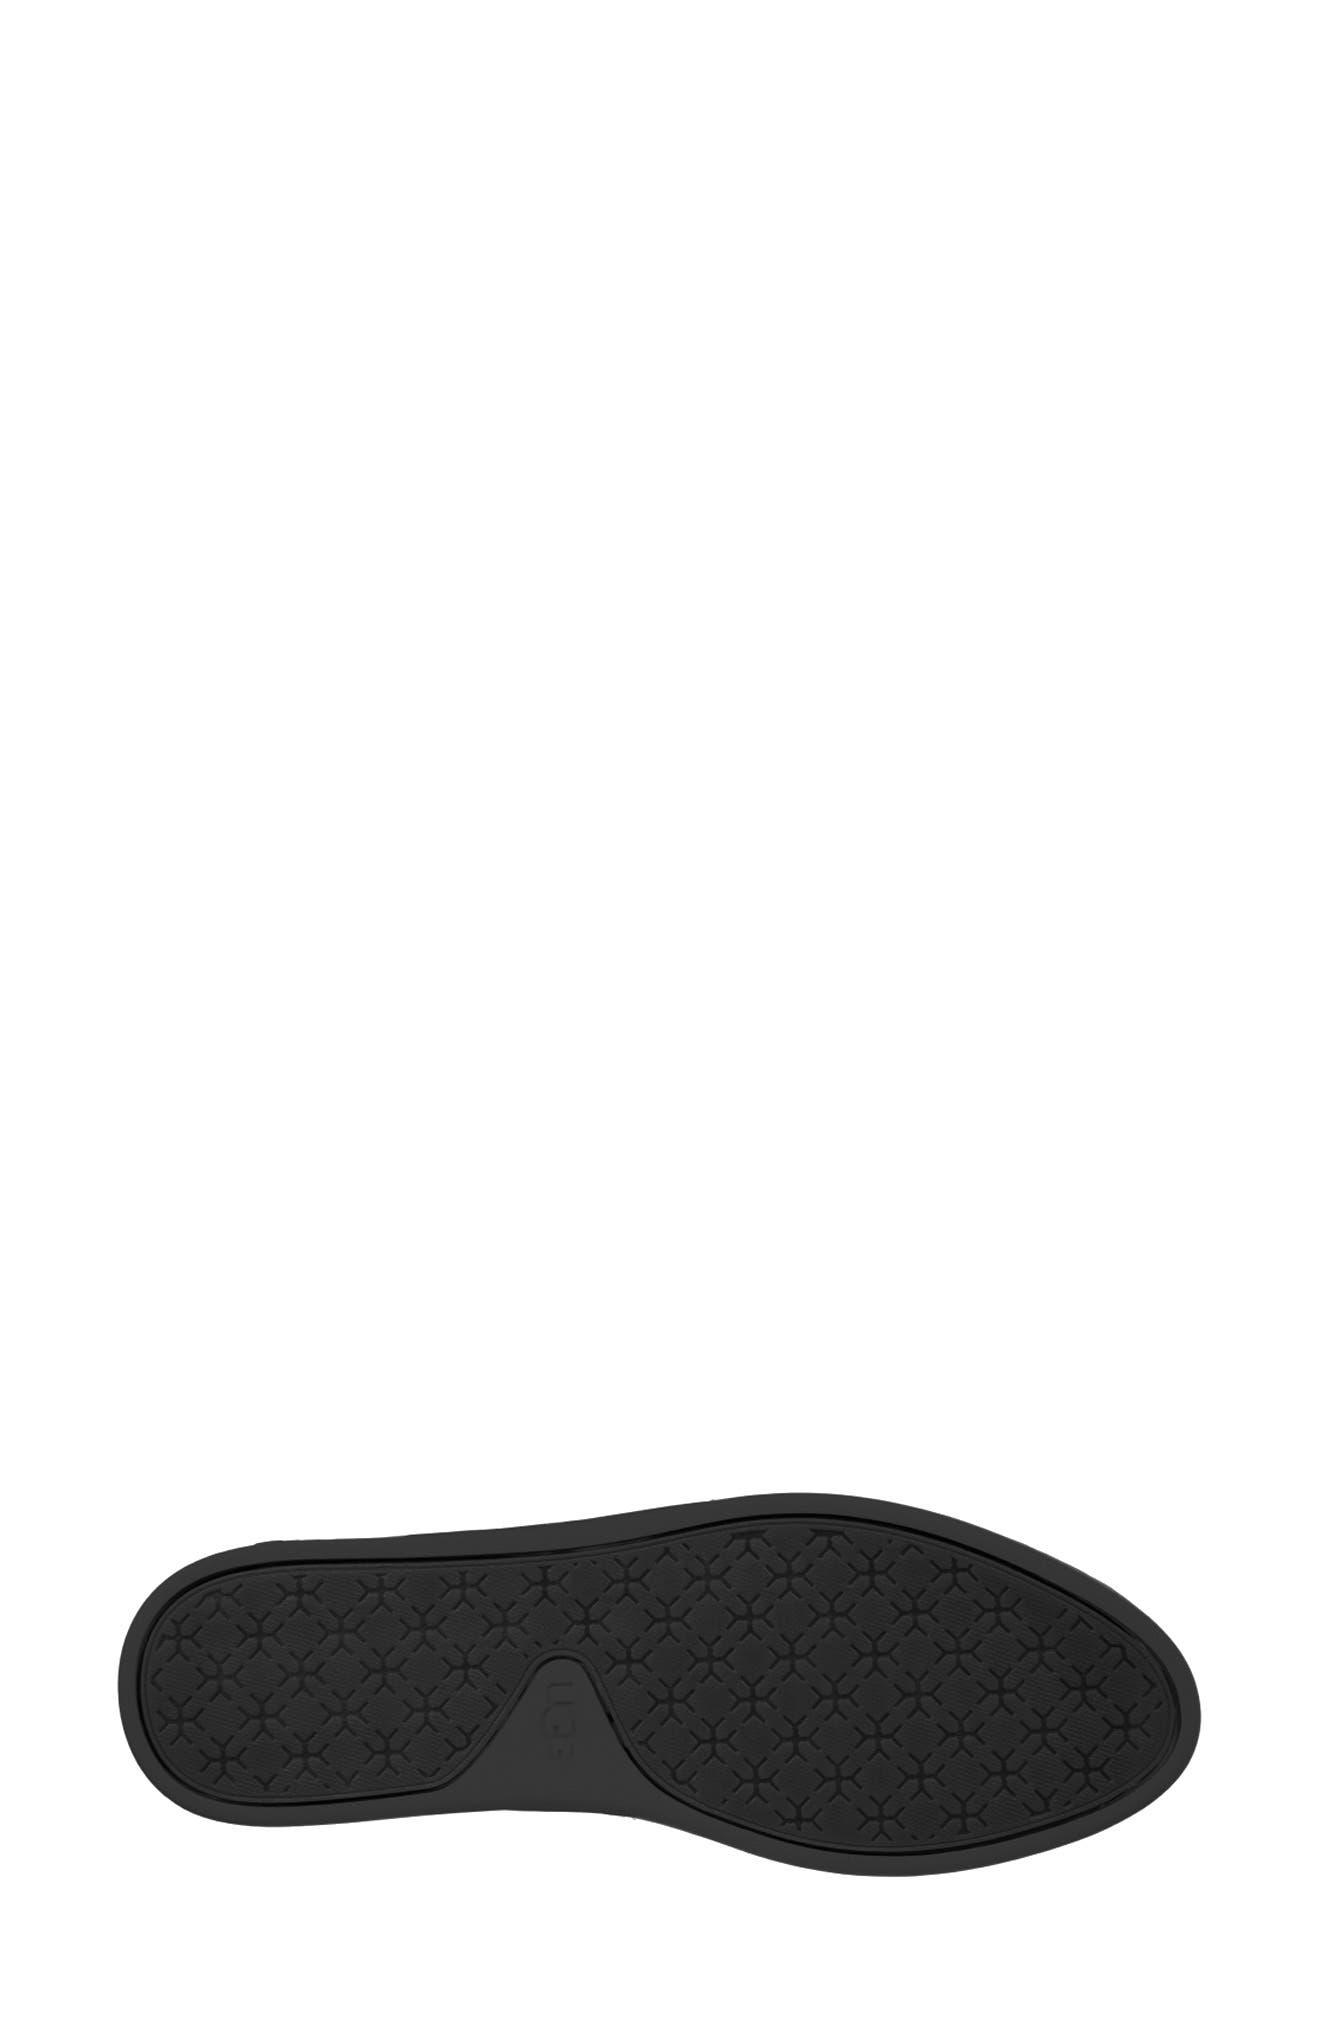 Sammy Sneaker,                             Alternate thumbnail 5, color,                             BLACK/ BLACK FABRIC